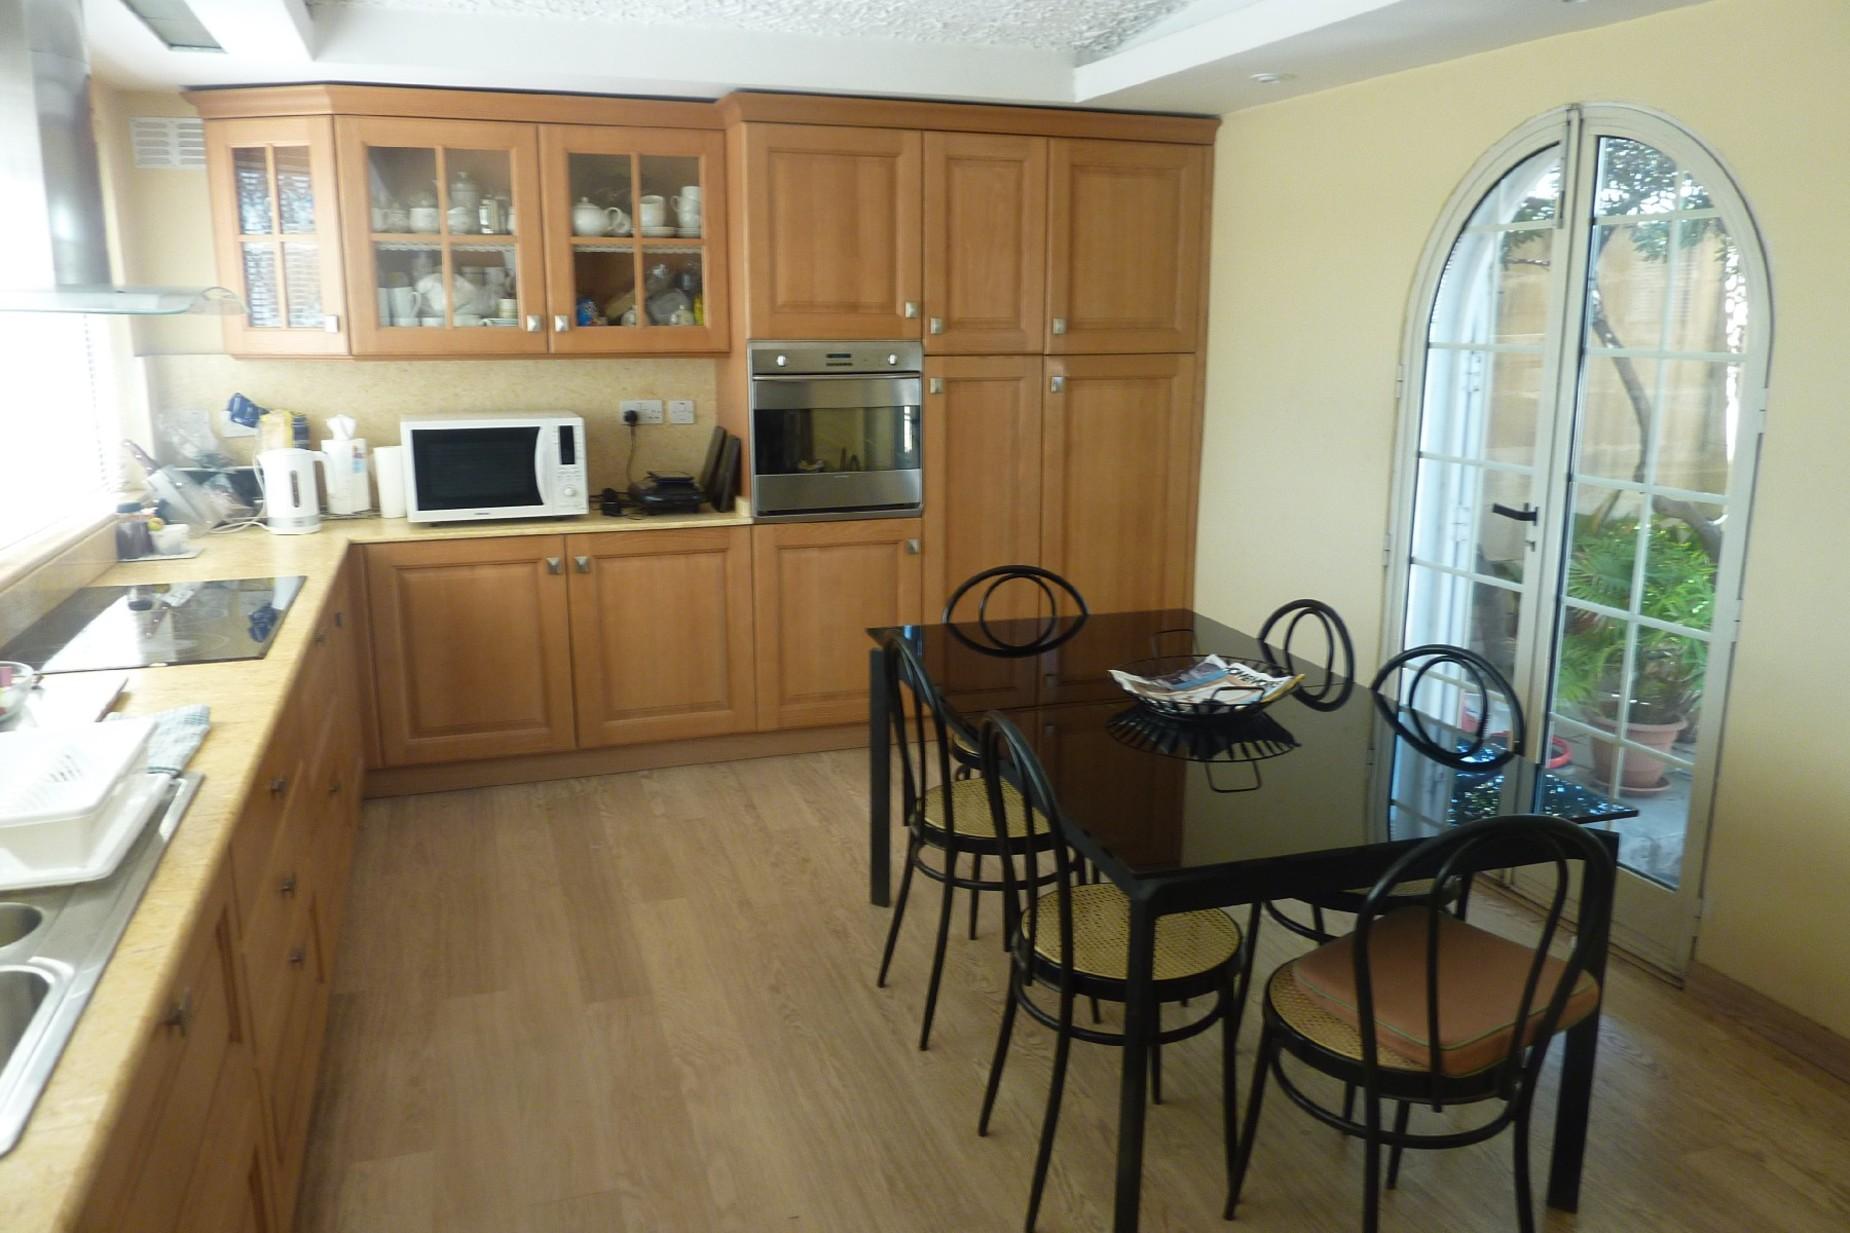 4 bed Villa For Sale in Gzira, Gzira - thumb 3